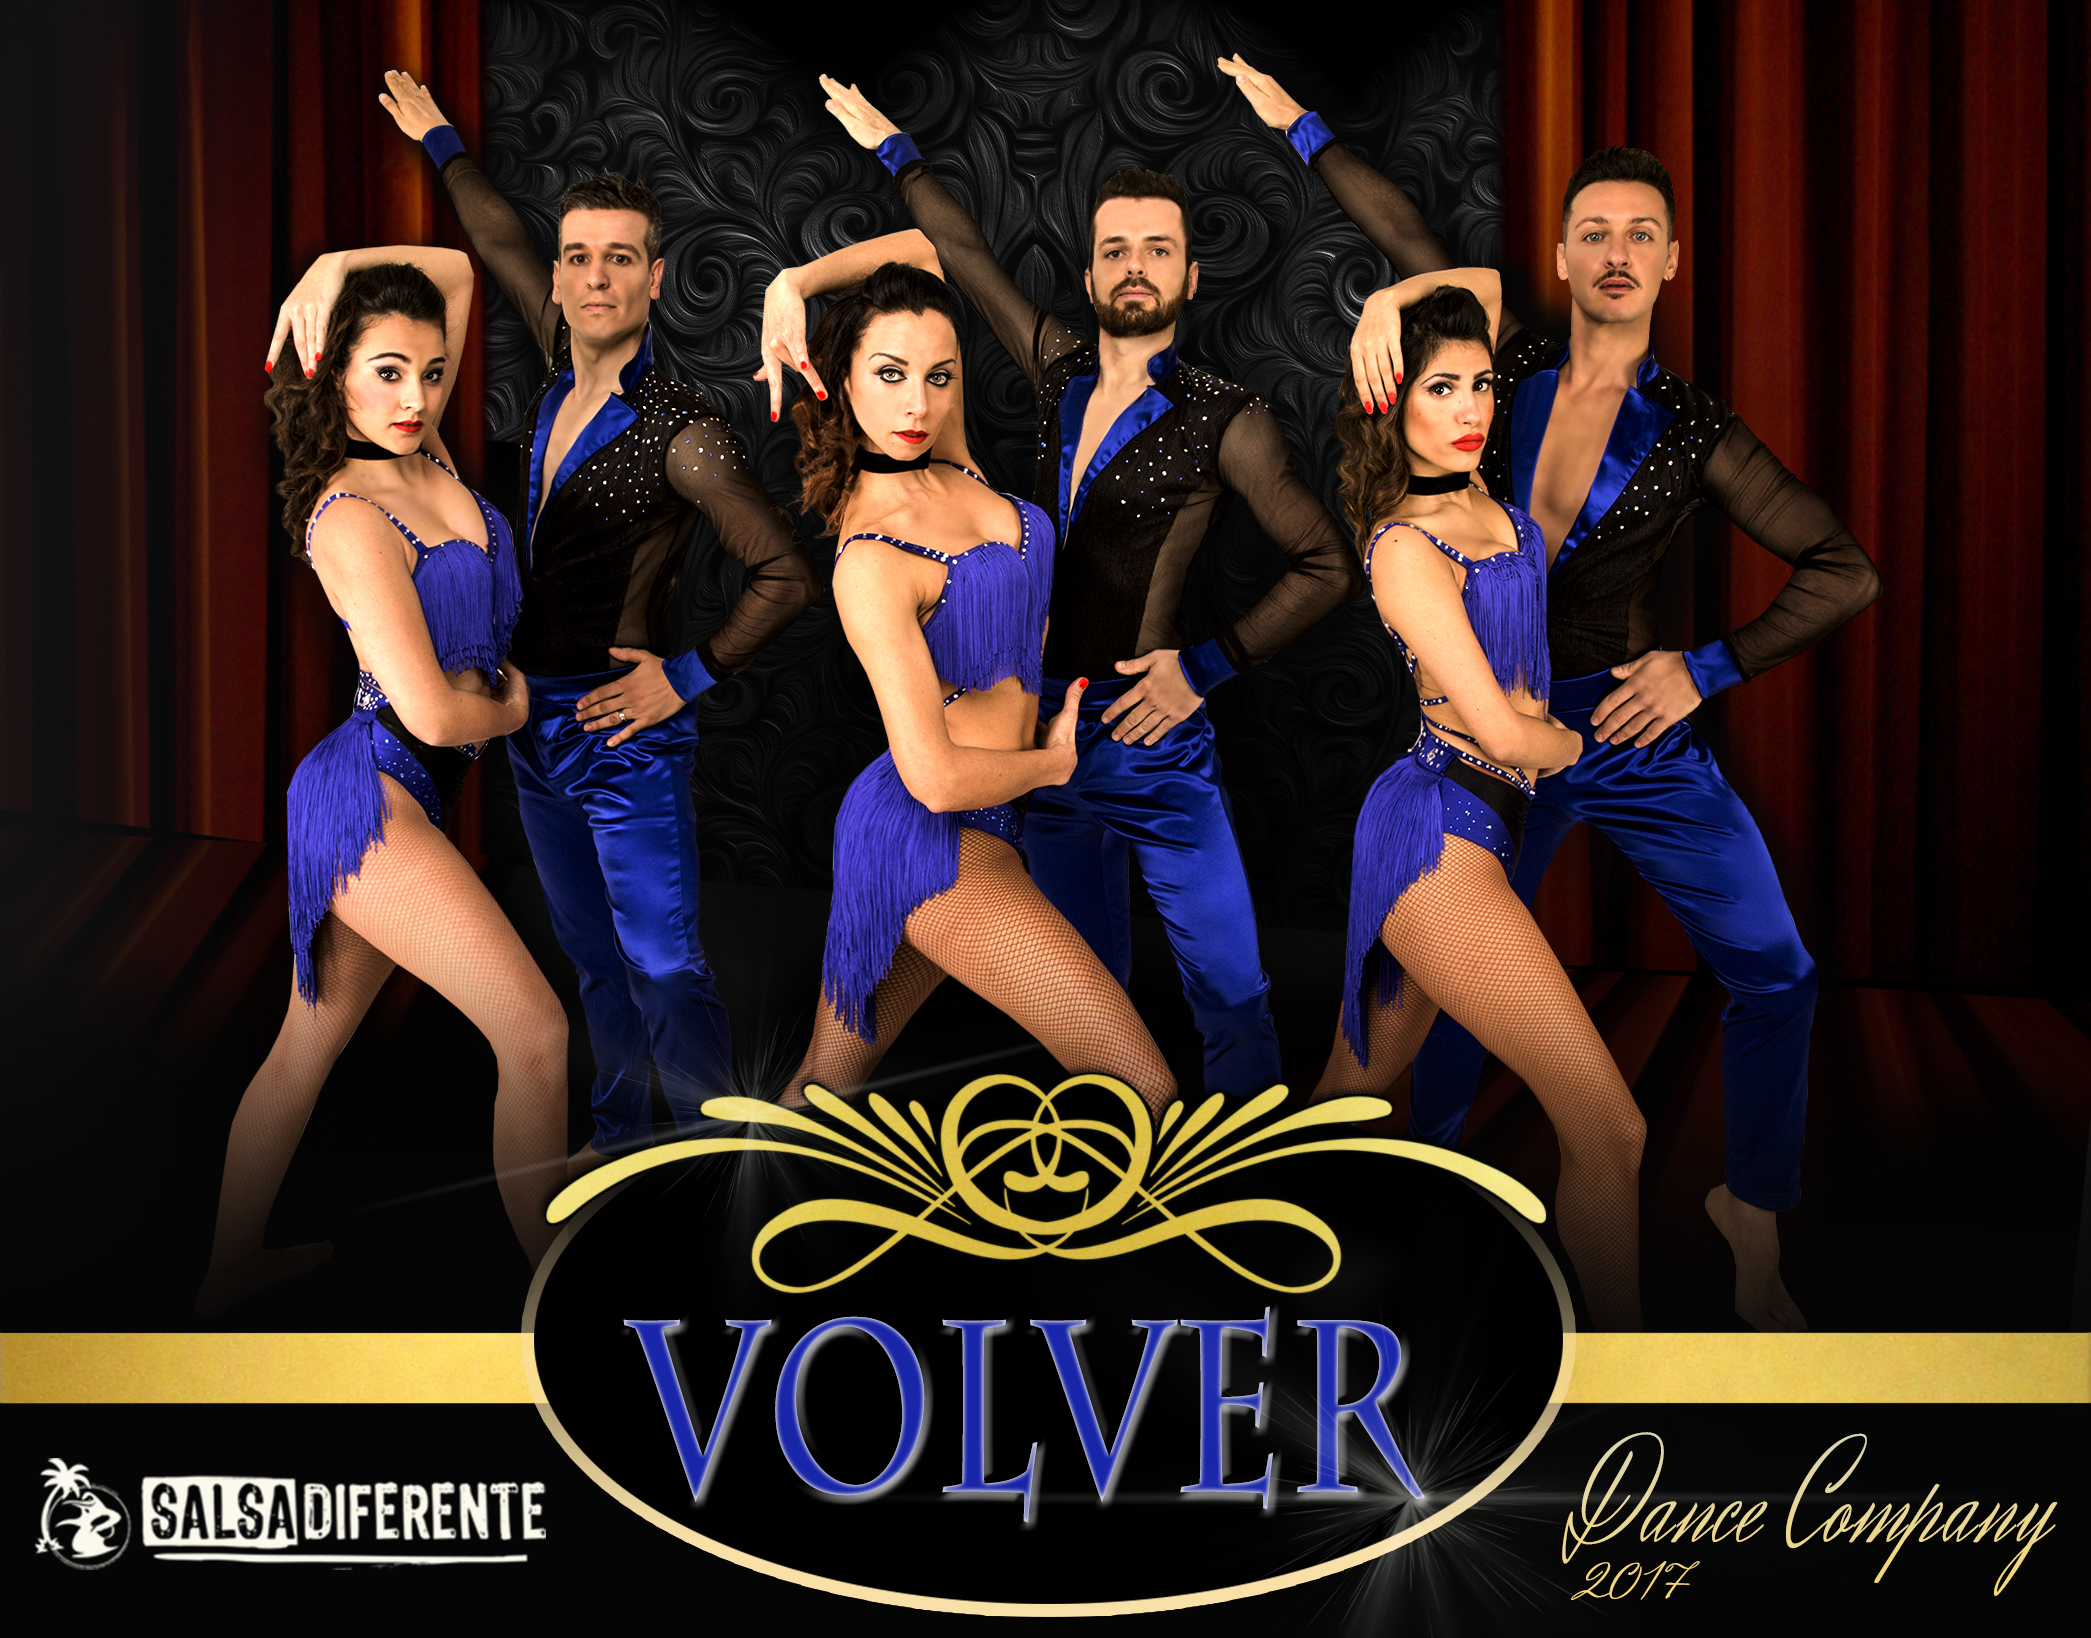 volver dance company salsadiferente